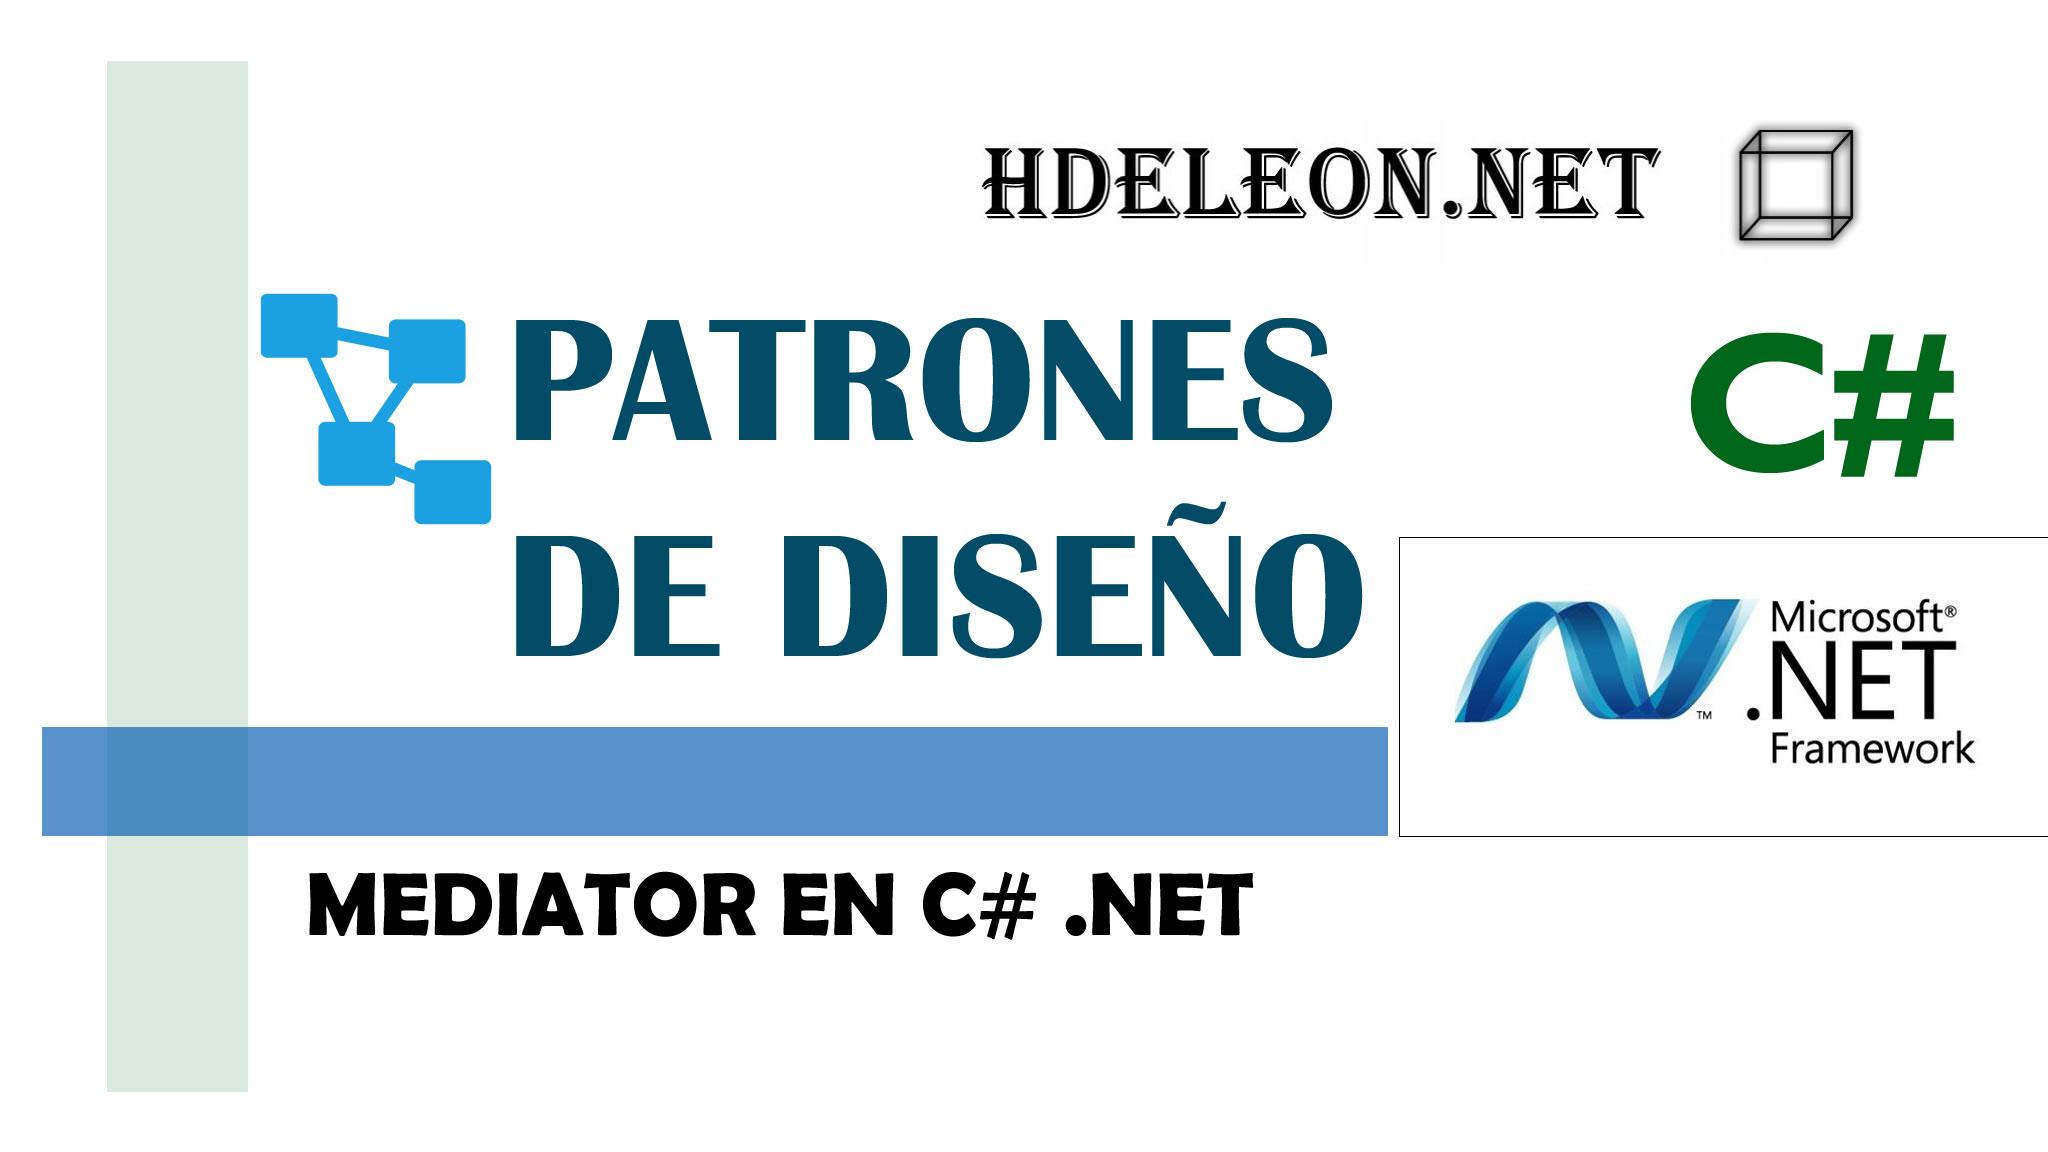 Mediator en C# .Net, Patrones de diseño, design patterns #6